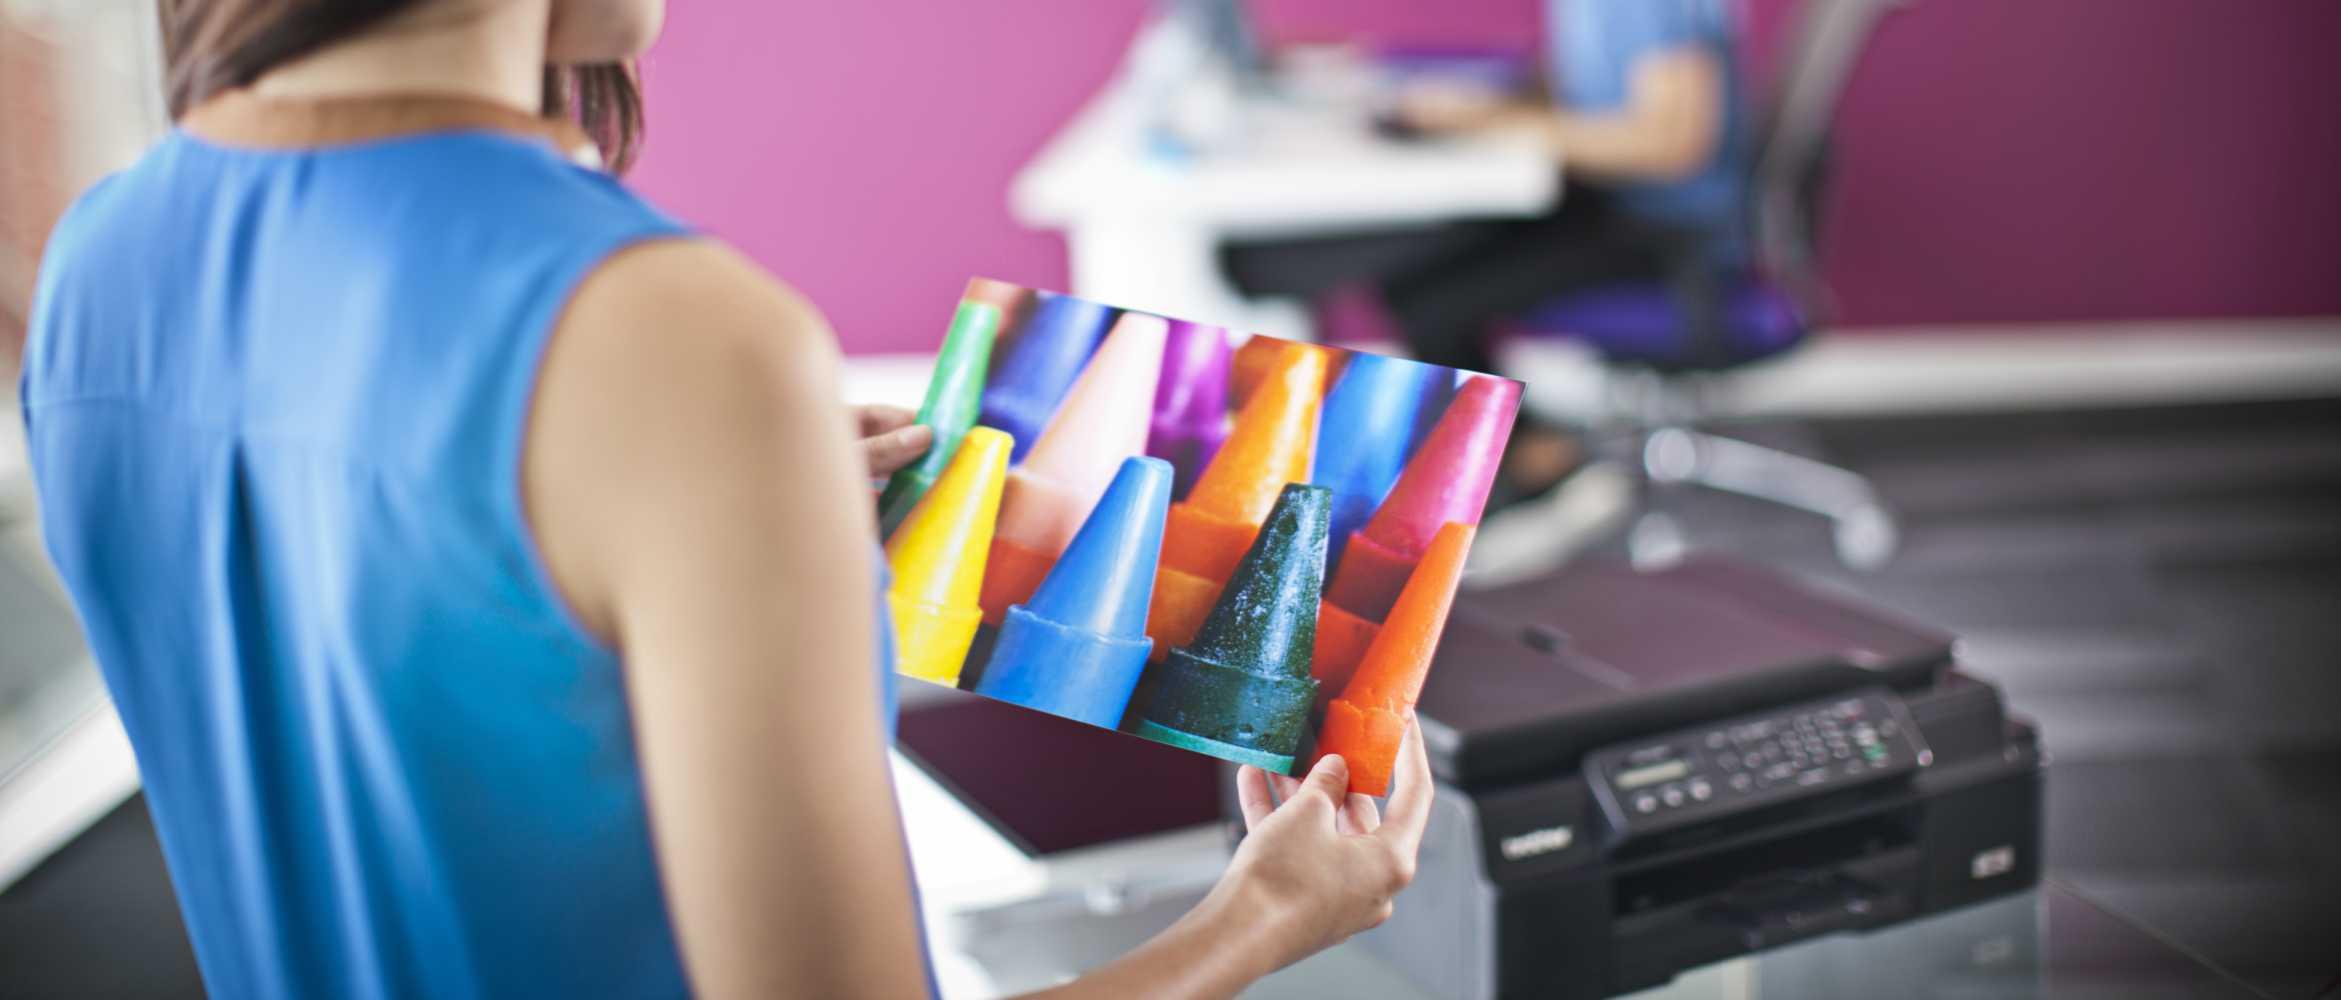 Mujer sujetando folio impreso a color